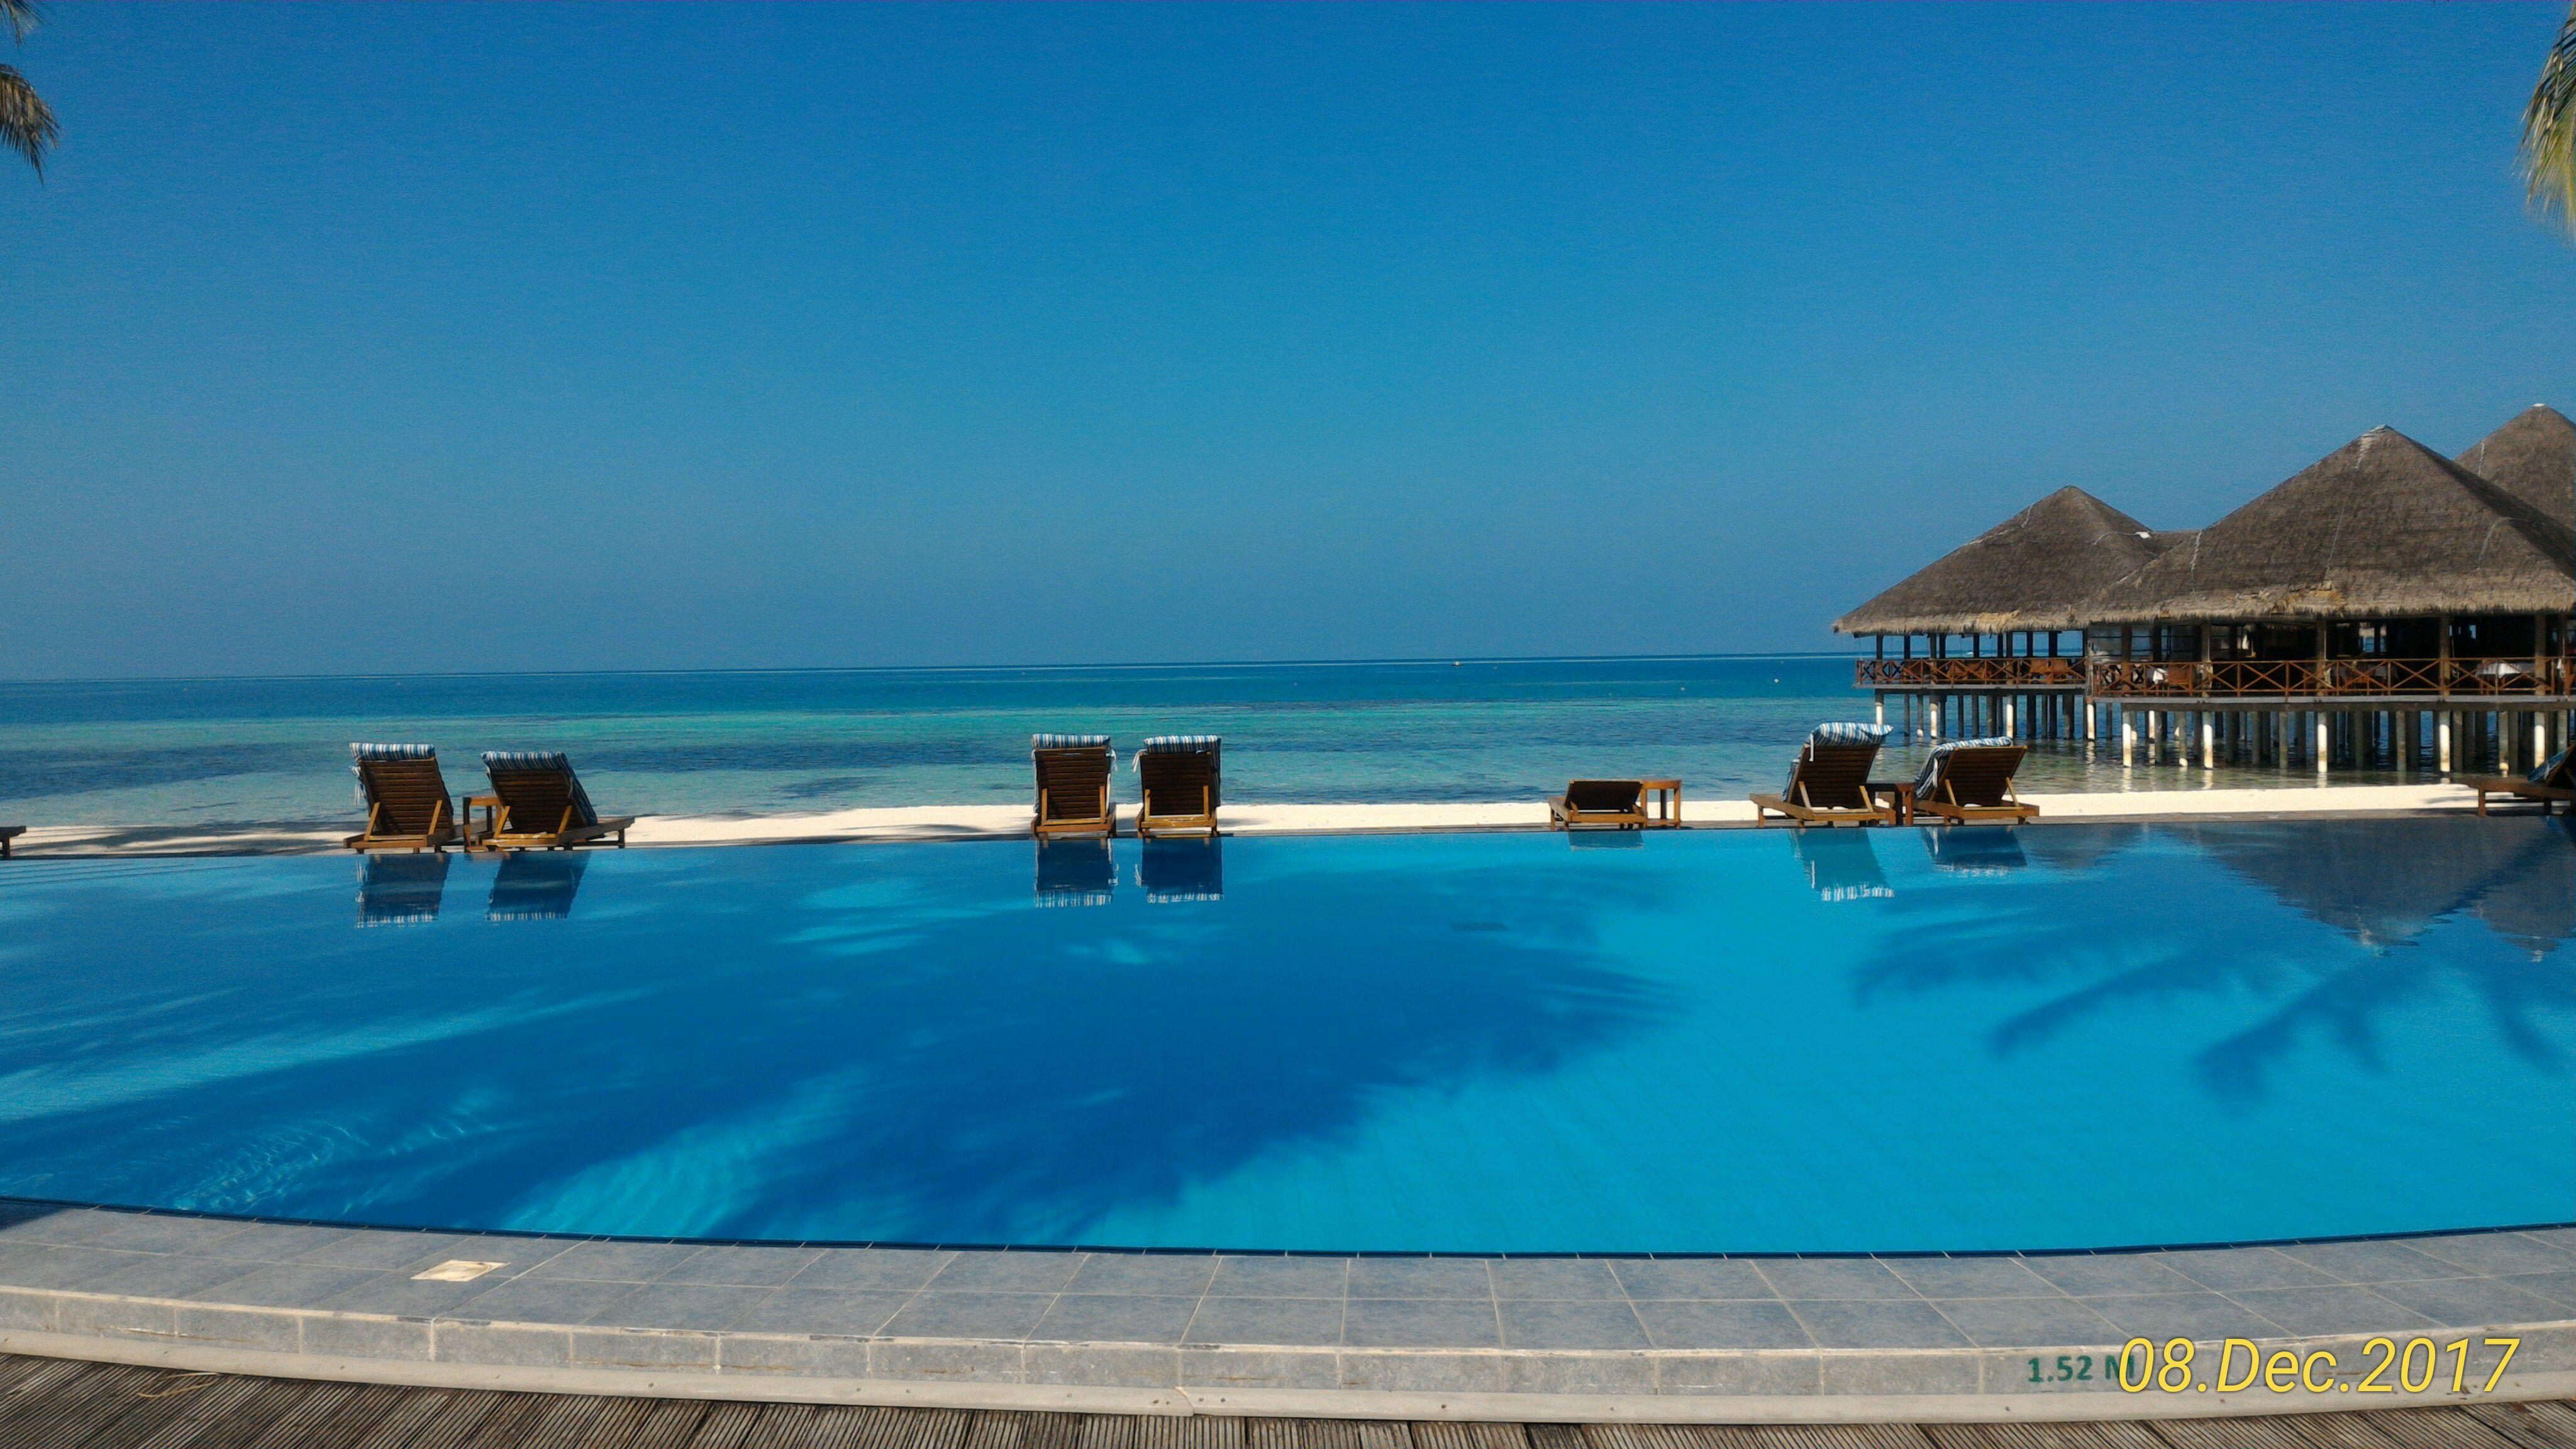 File:Swimming Pool in Maldives Island Resort.jpg - Wikimedia ...